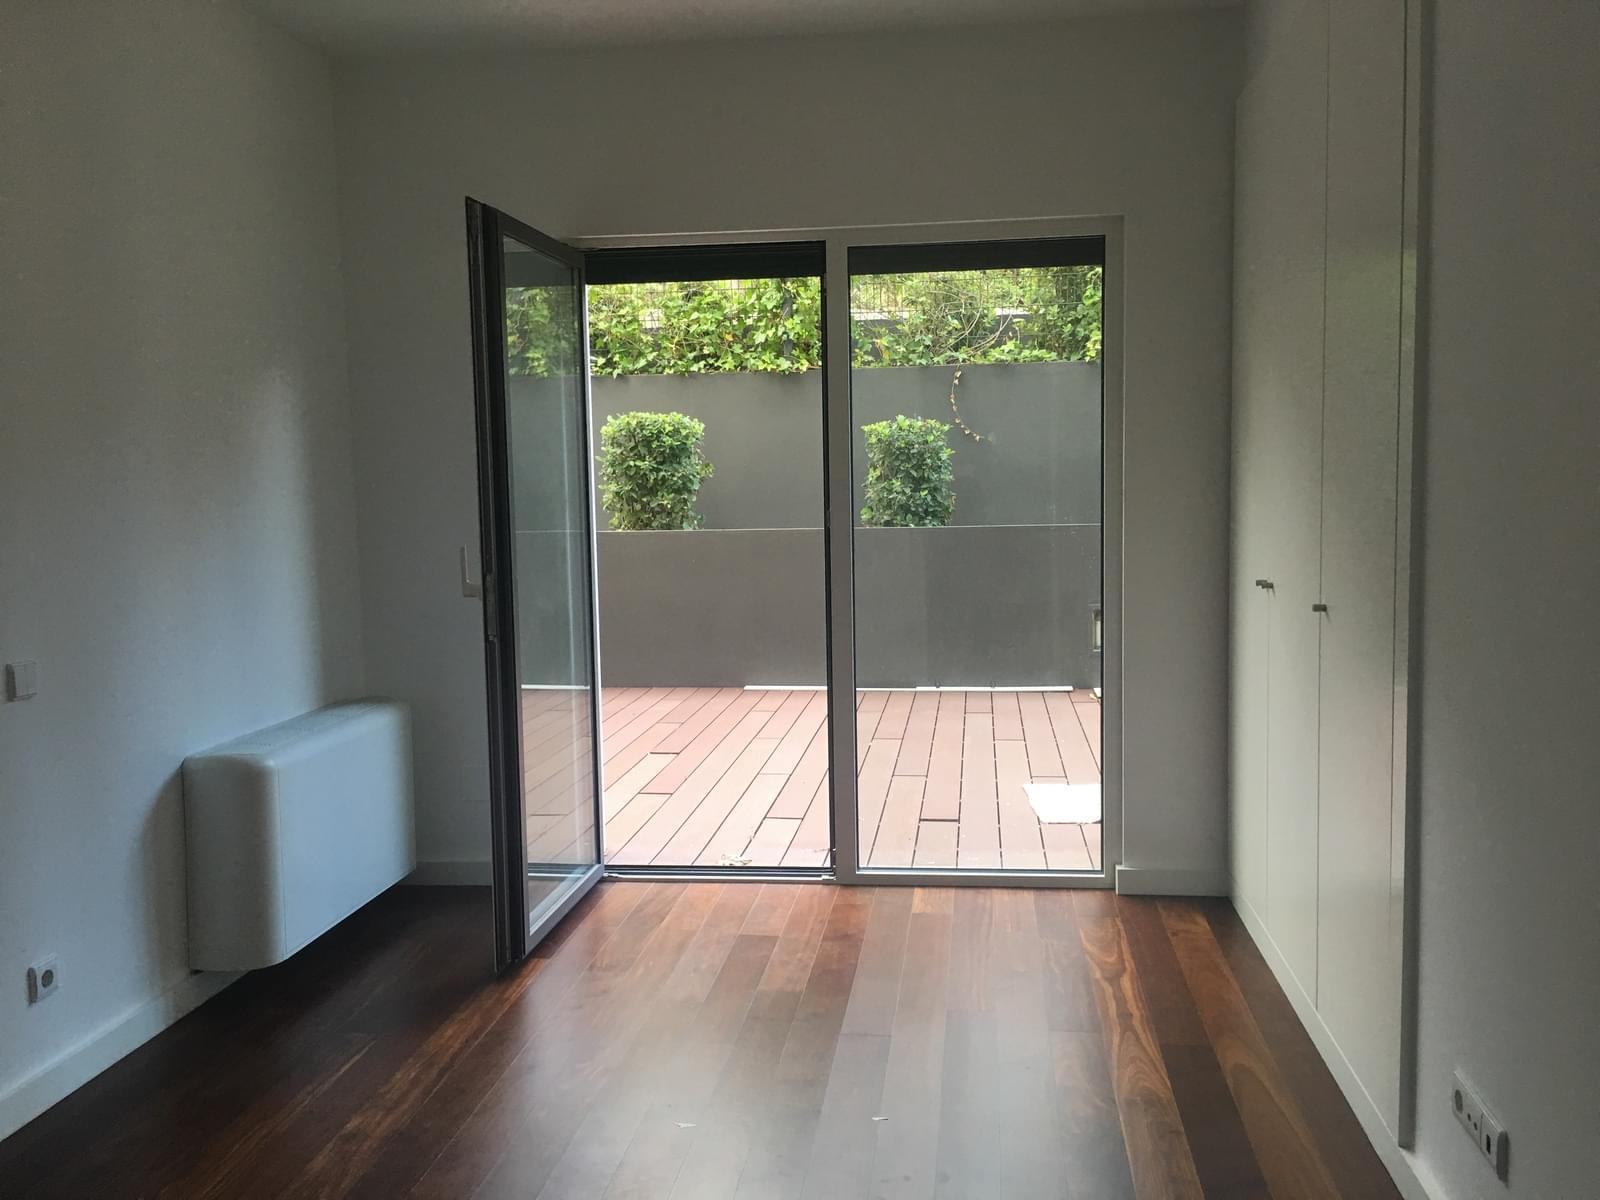 pf17018-apartamento-t2-lisboa-c512bb6a-e825-4fa9-8187-925f5f9d6ee1